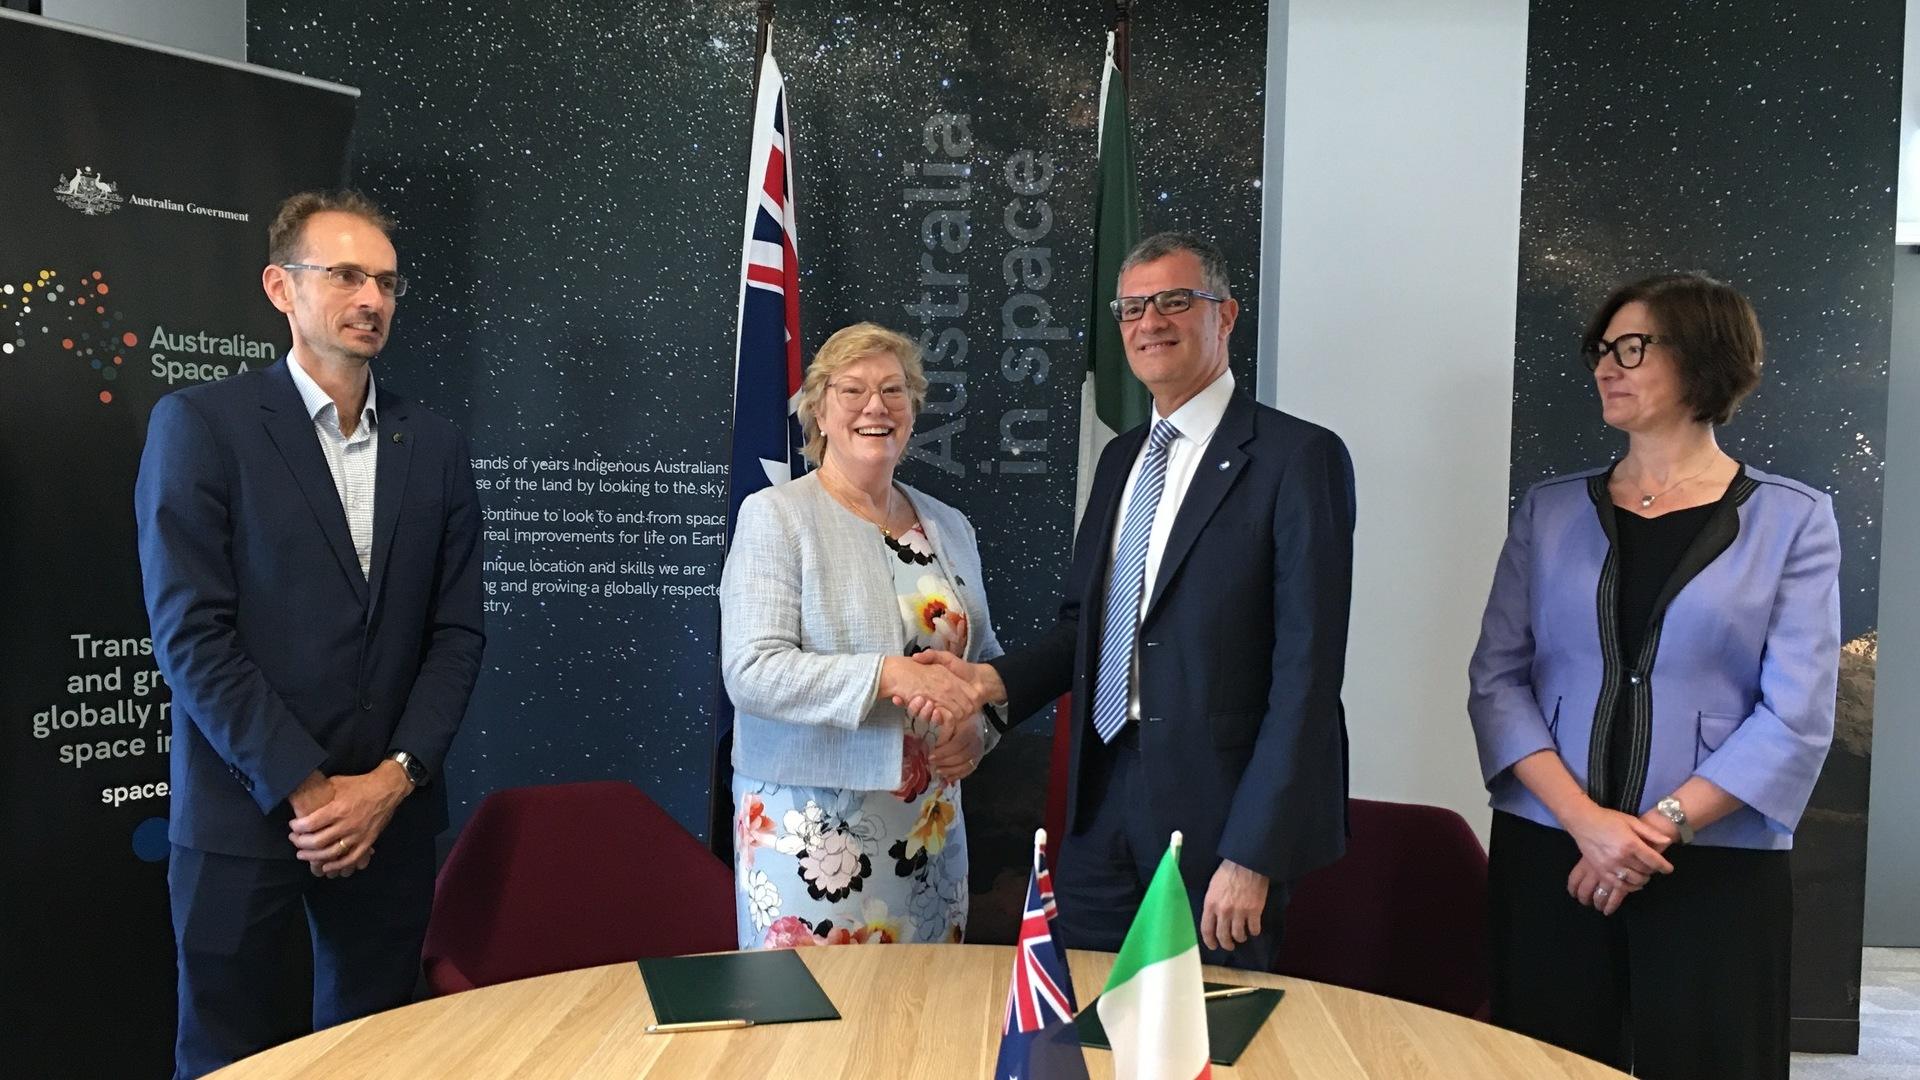 Cooperazione internazionale, firmata una dichiarazione d'intenti tra l'ASI e l'Agenzia Spaziale Australiana